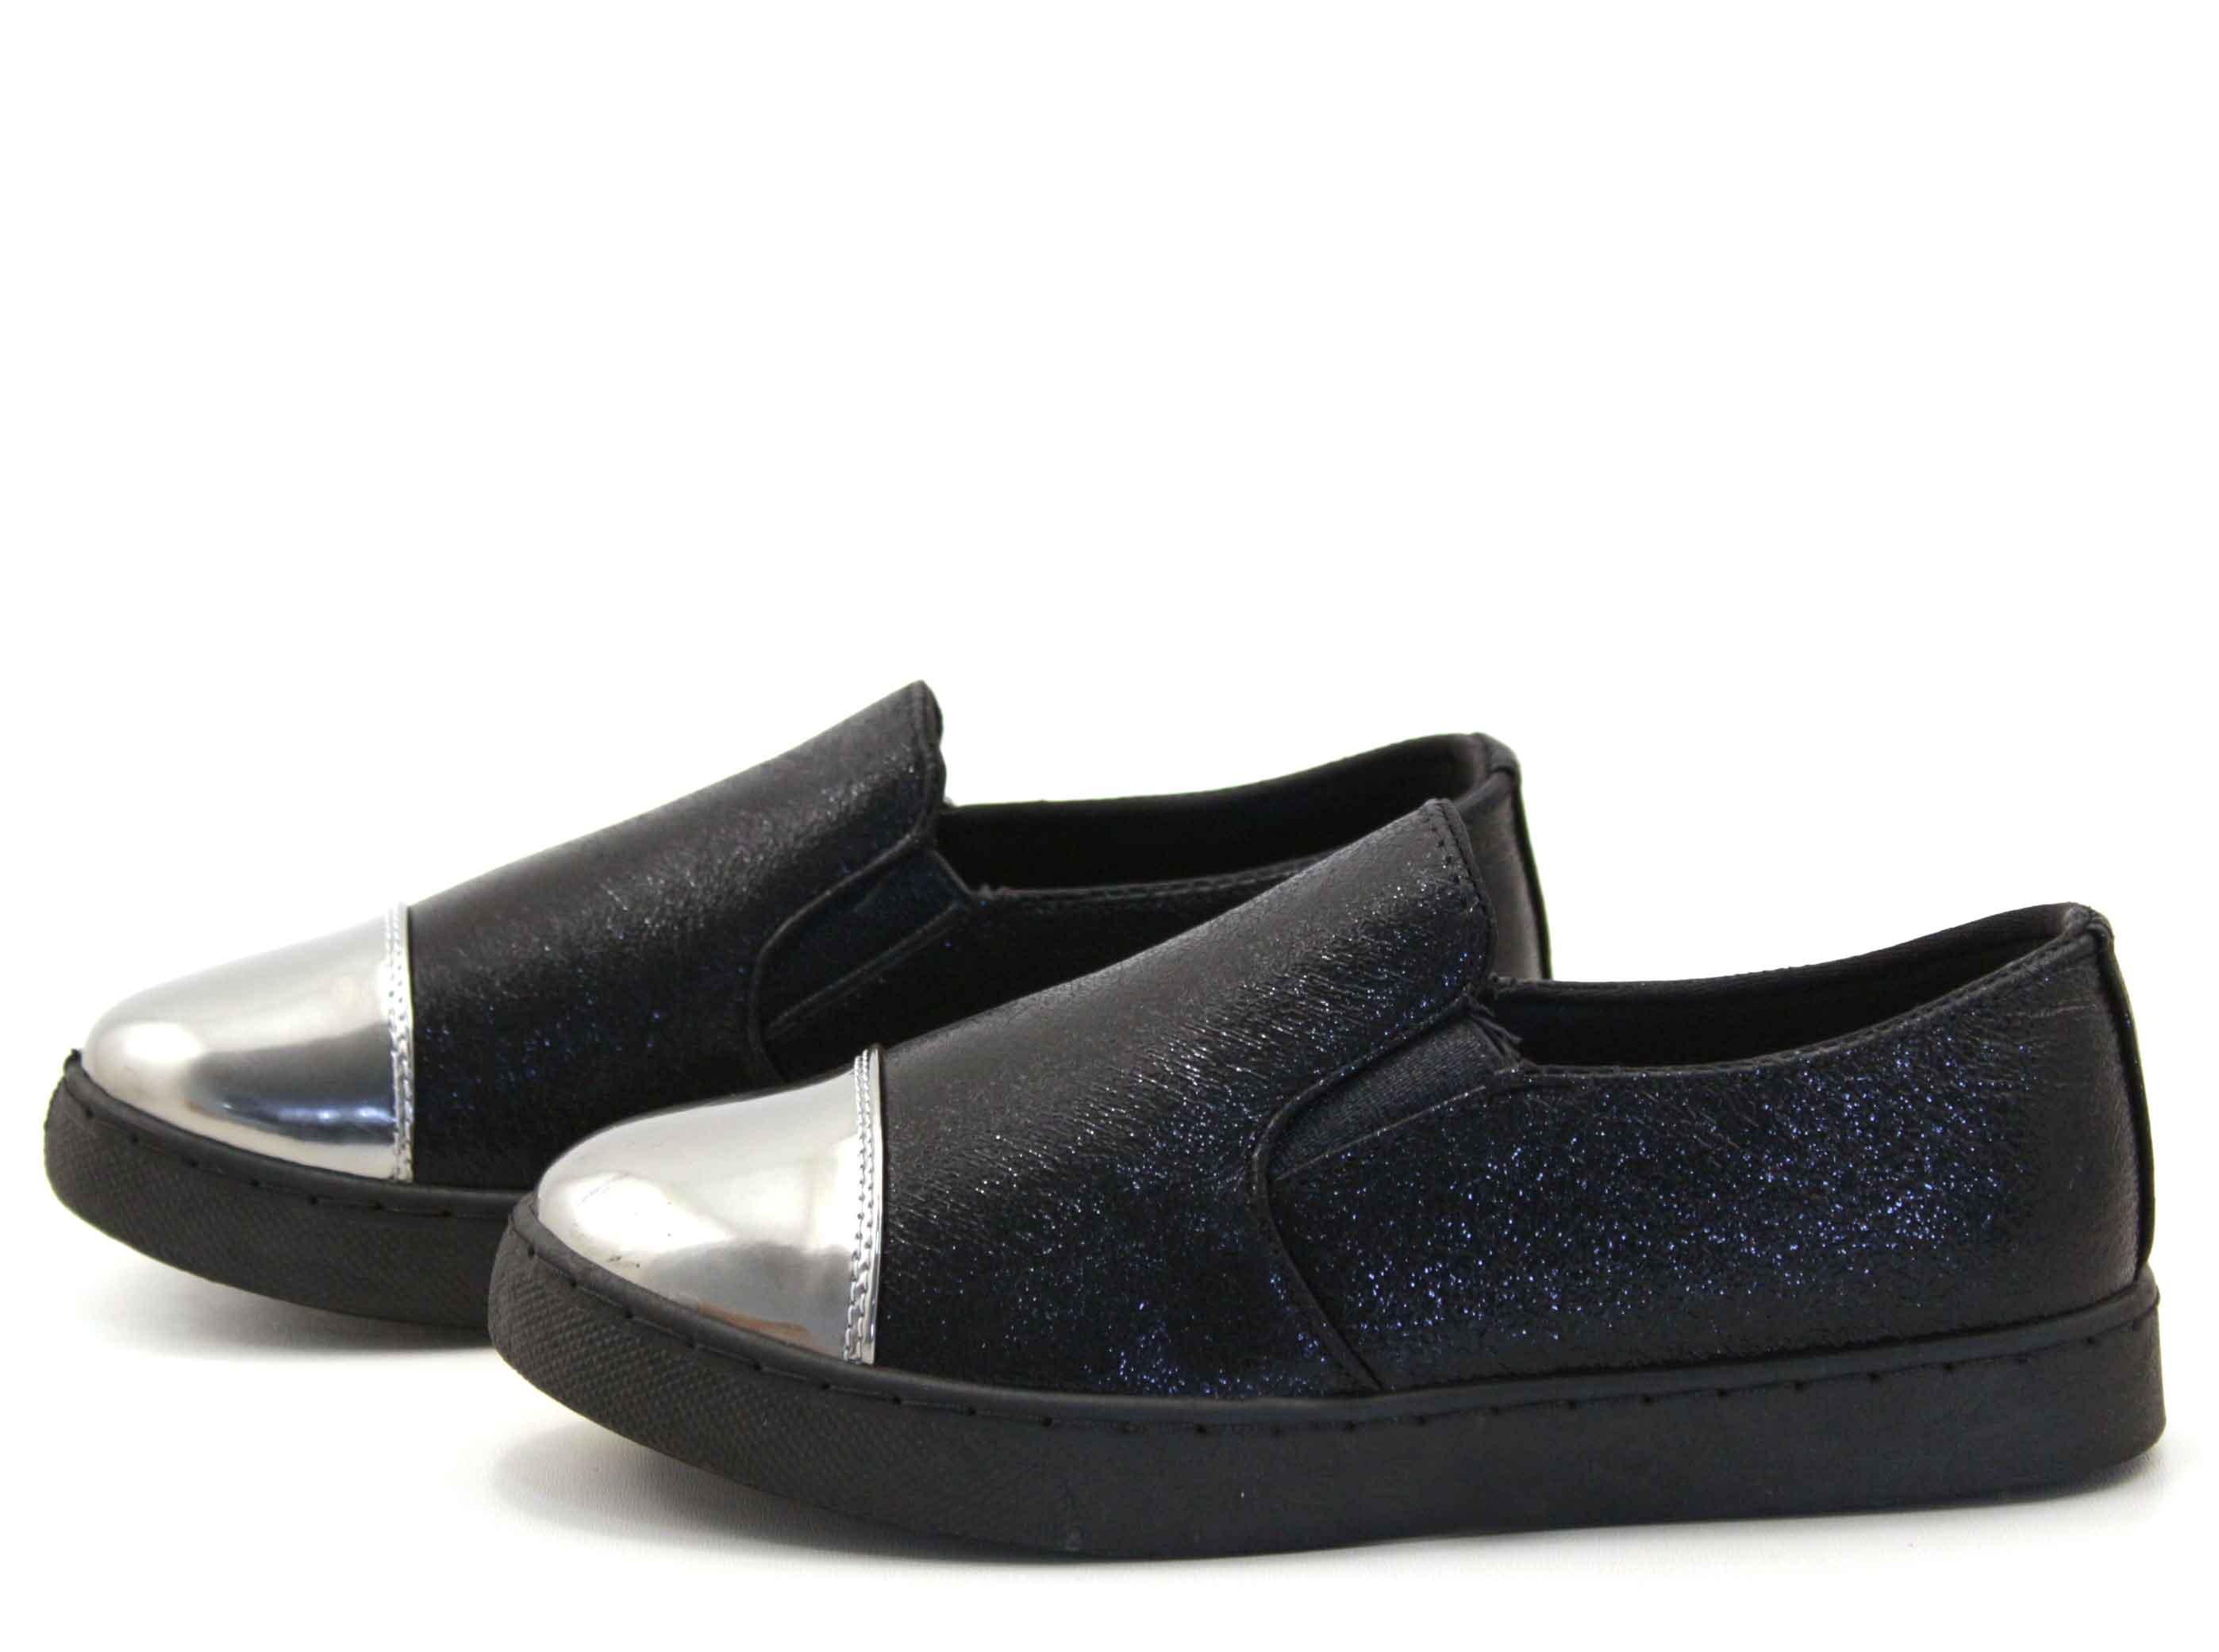 245d1dd476a ΓΥΝΑΙΚΕΙΑ CASUAL ΠΑΠΟΥΤΣΙΑ ΜΑΥΡΑ - Sneakers - Πάνινα, Casual-Oxford ...